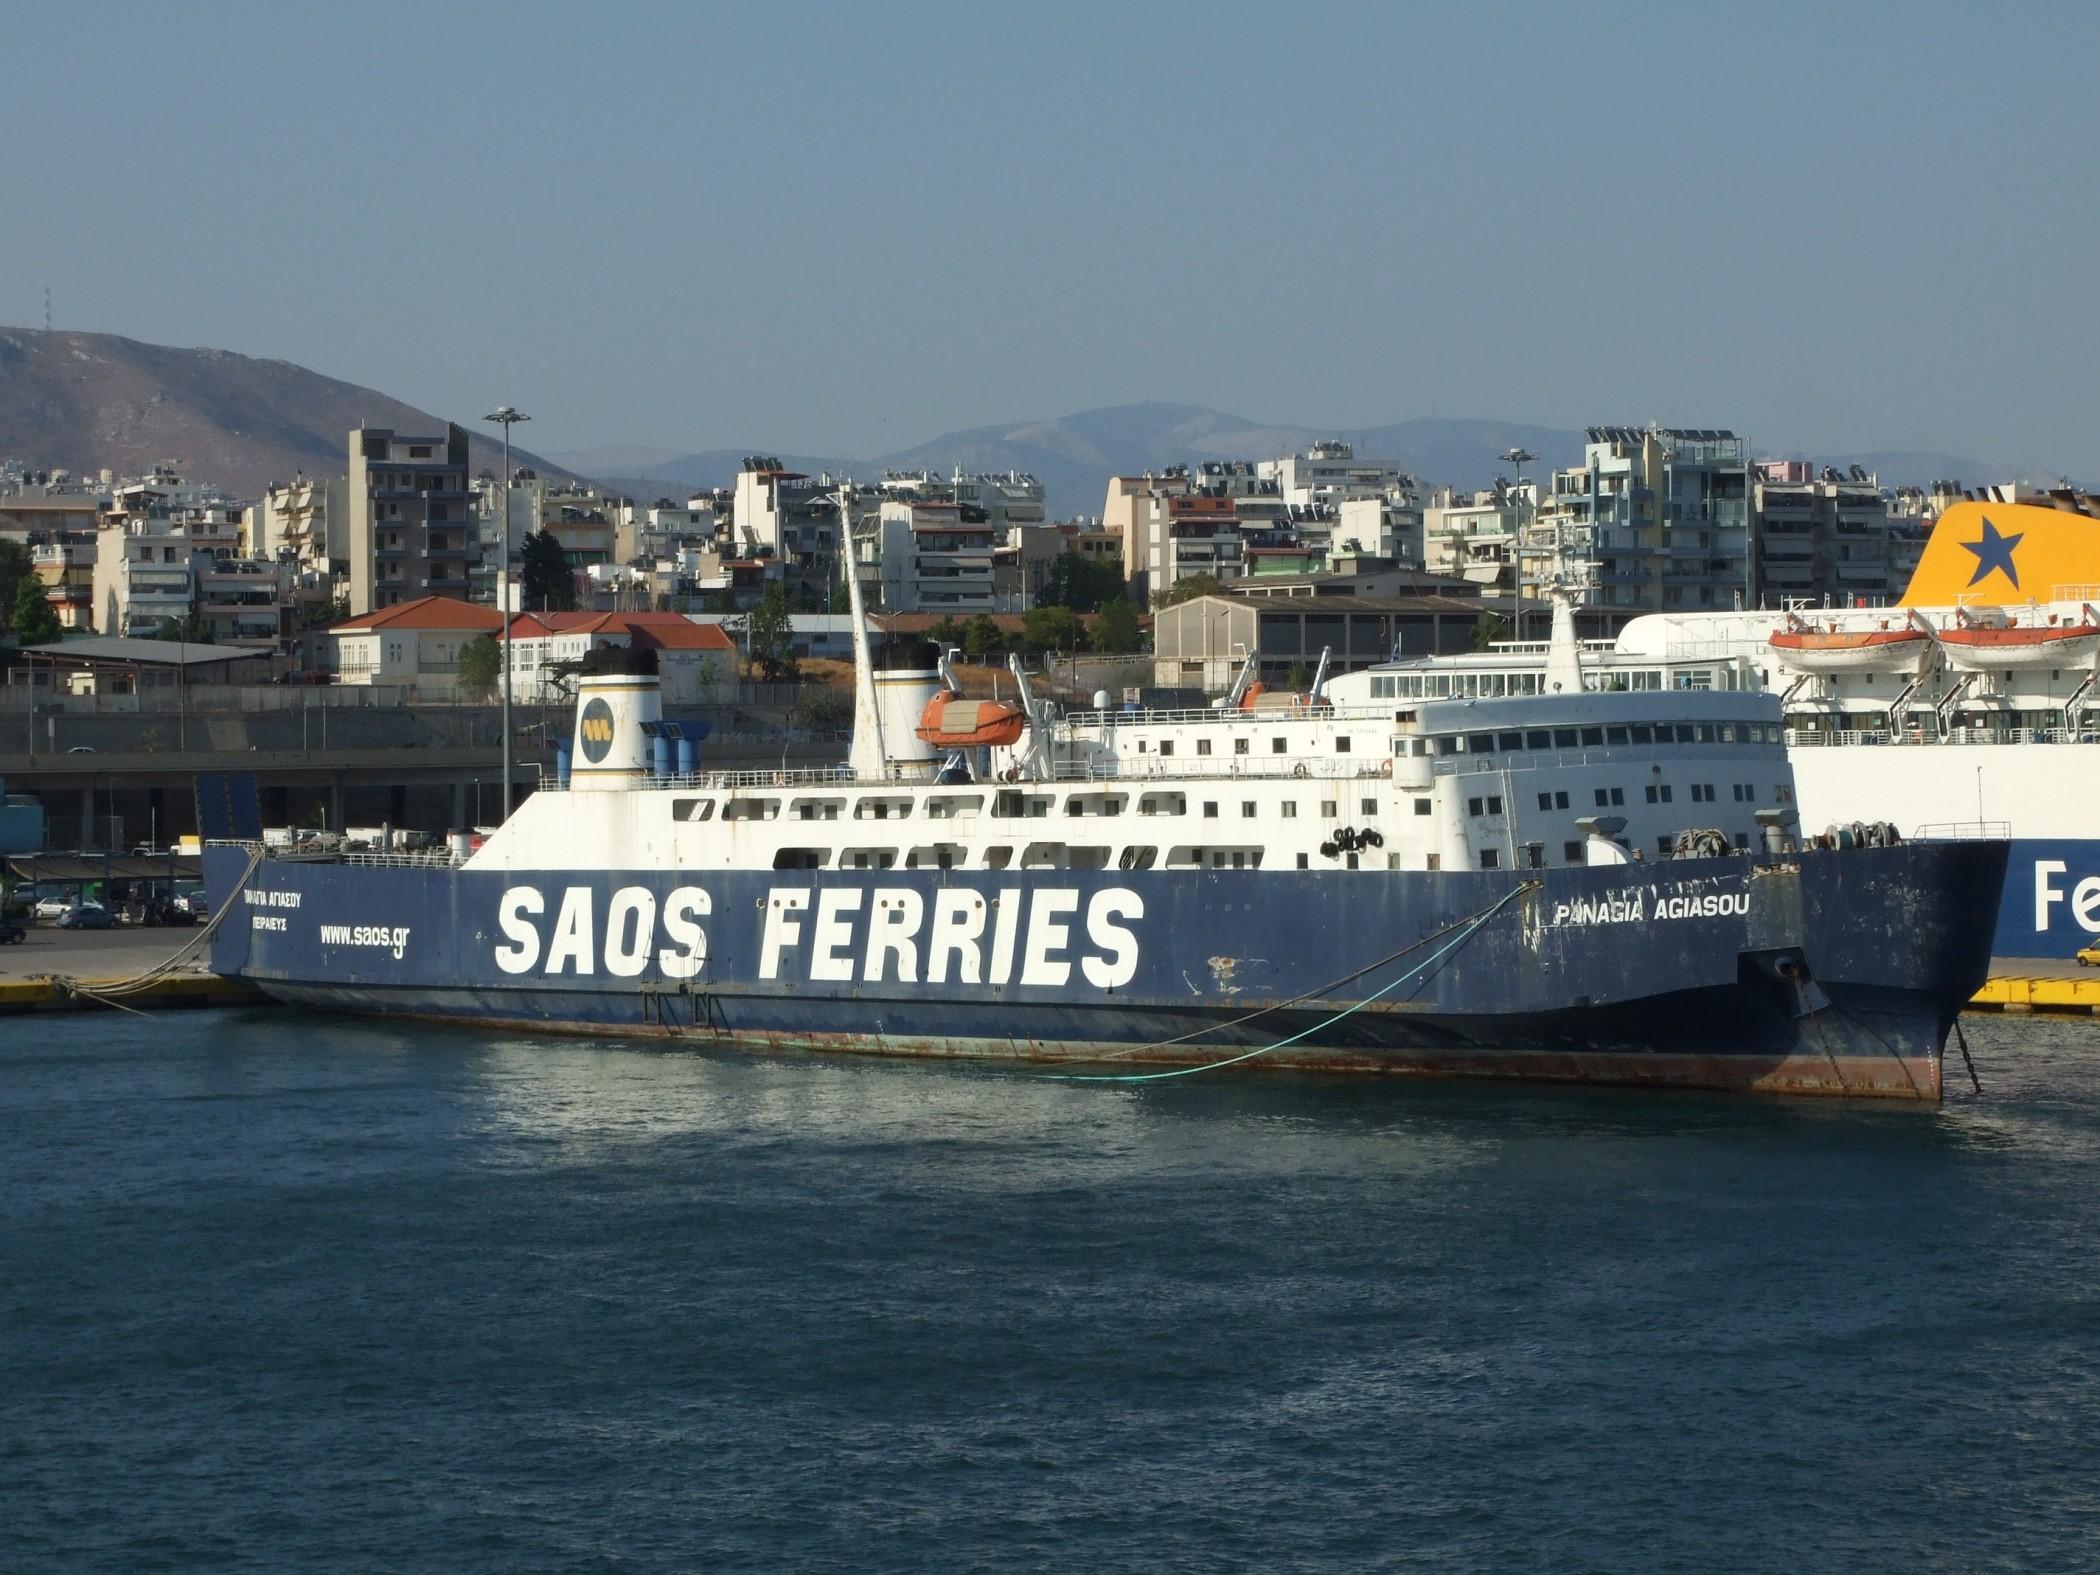 Panagia Agiasou at Piraeus